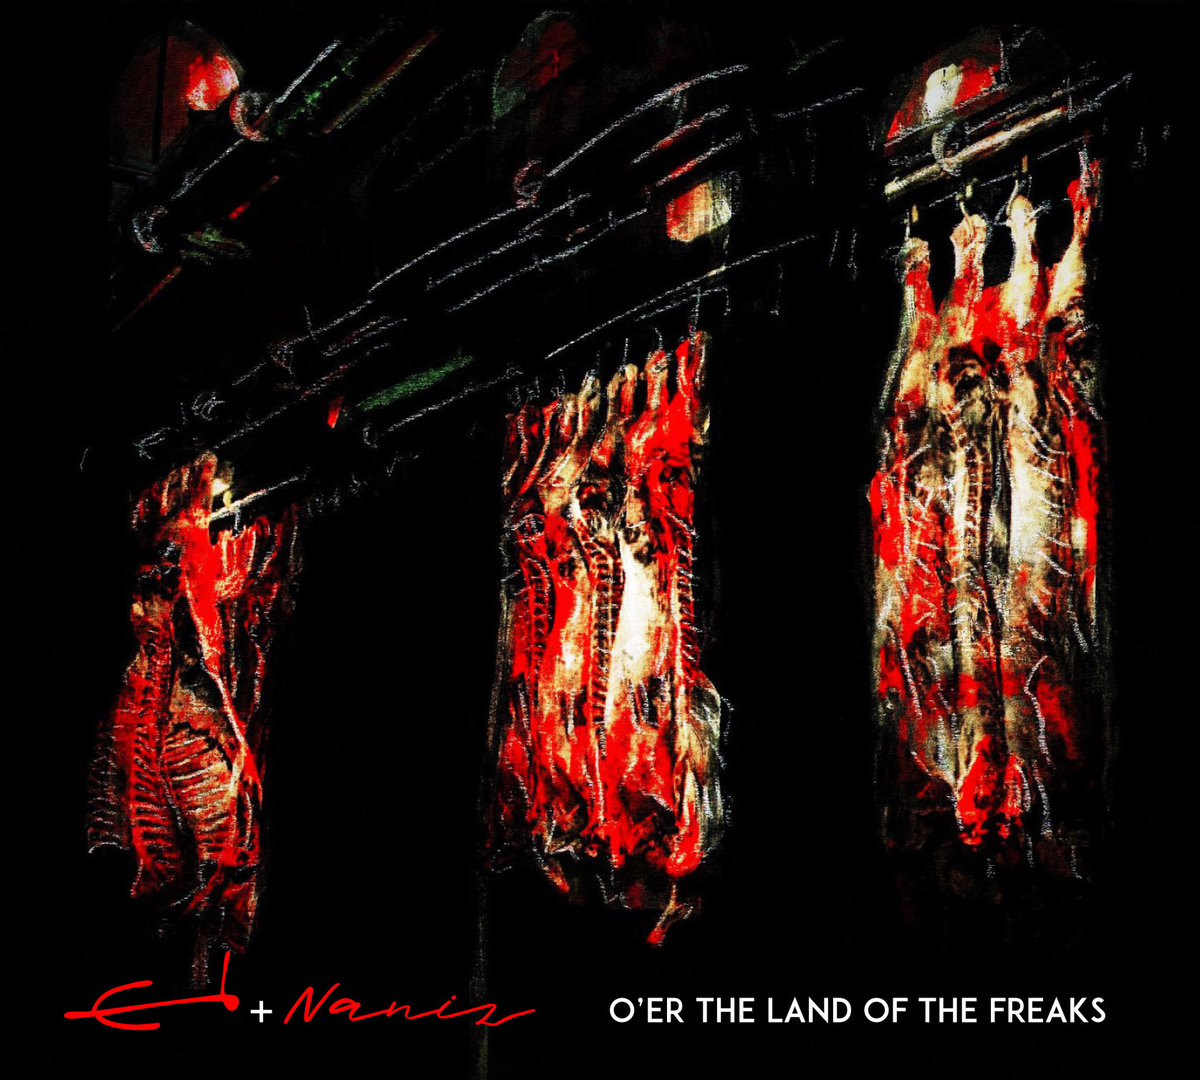 ESCLUSIVA: ENOMISOSSAB feat NANIZ O'ER THE LAND OF THE FREAKS 8 - fanzine